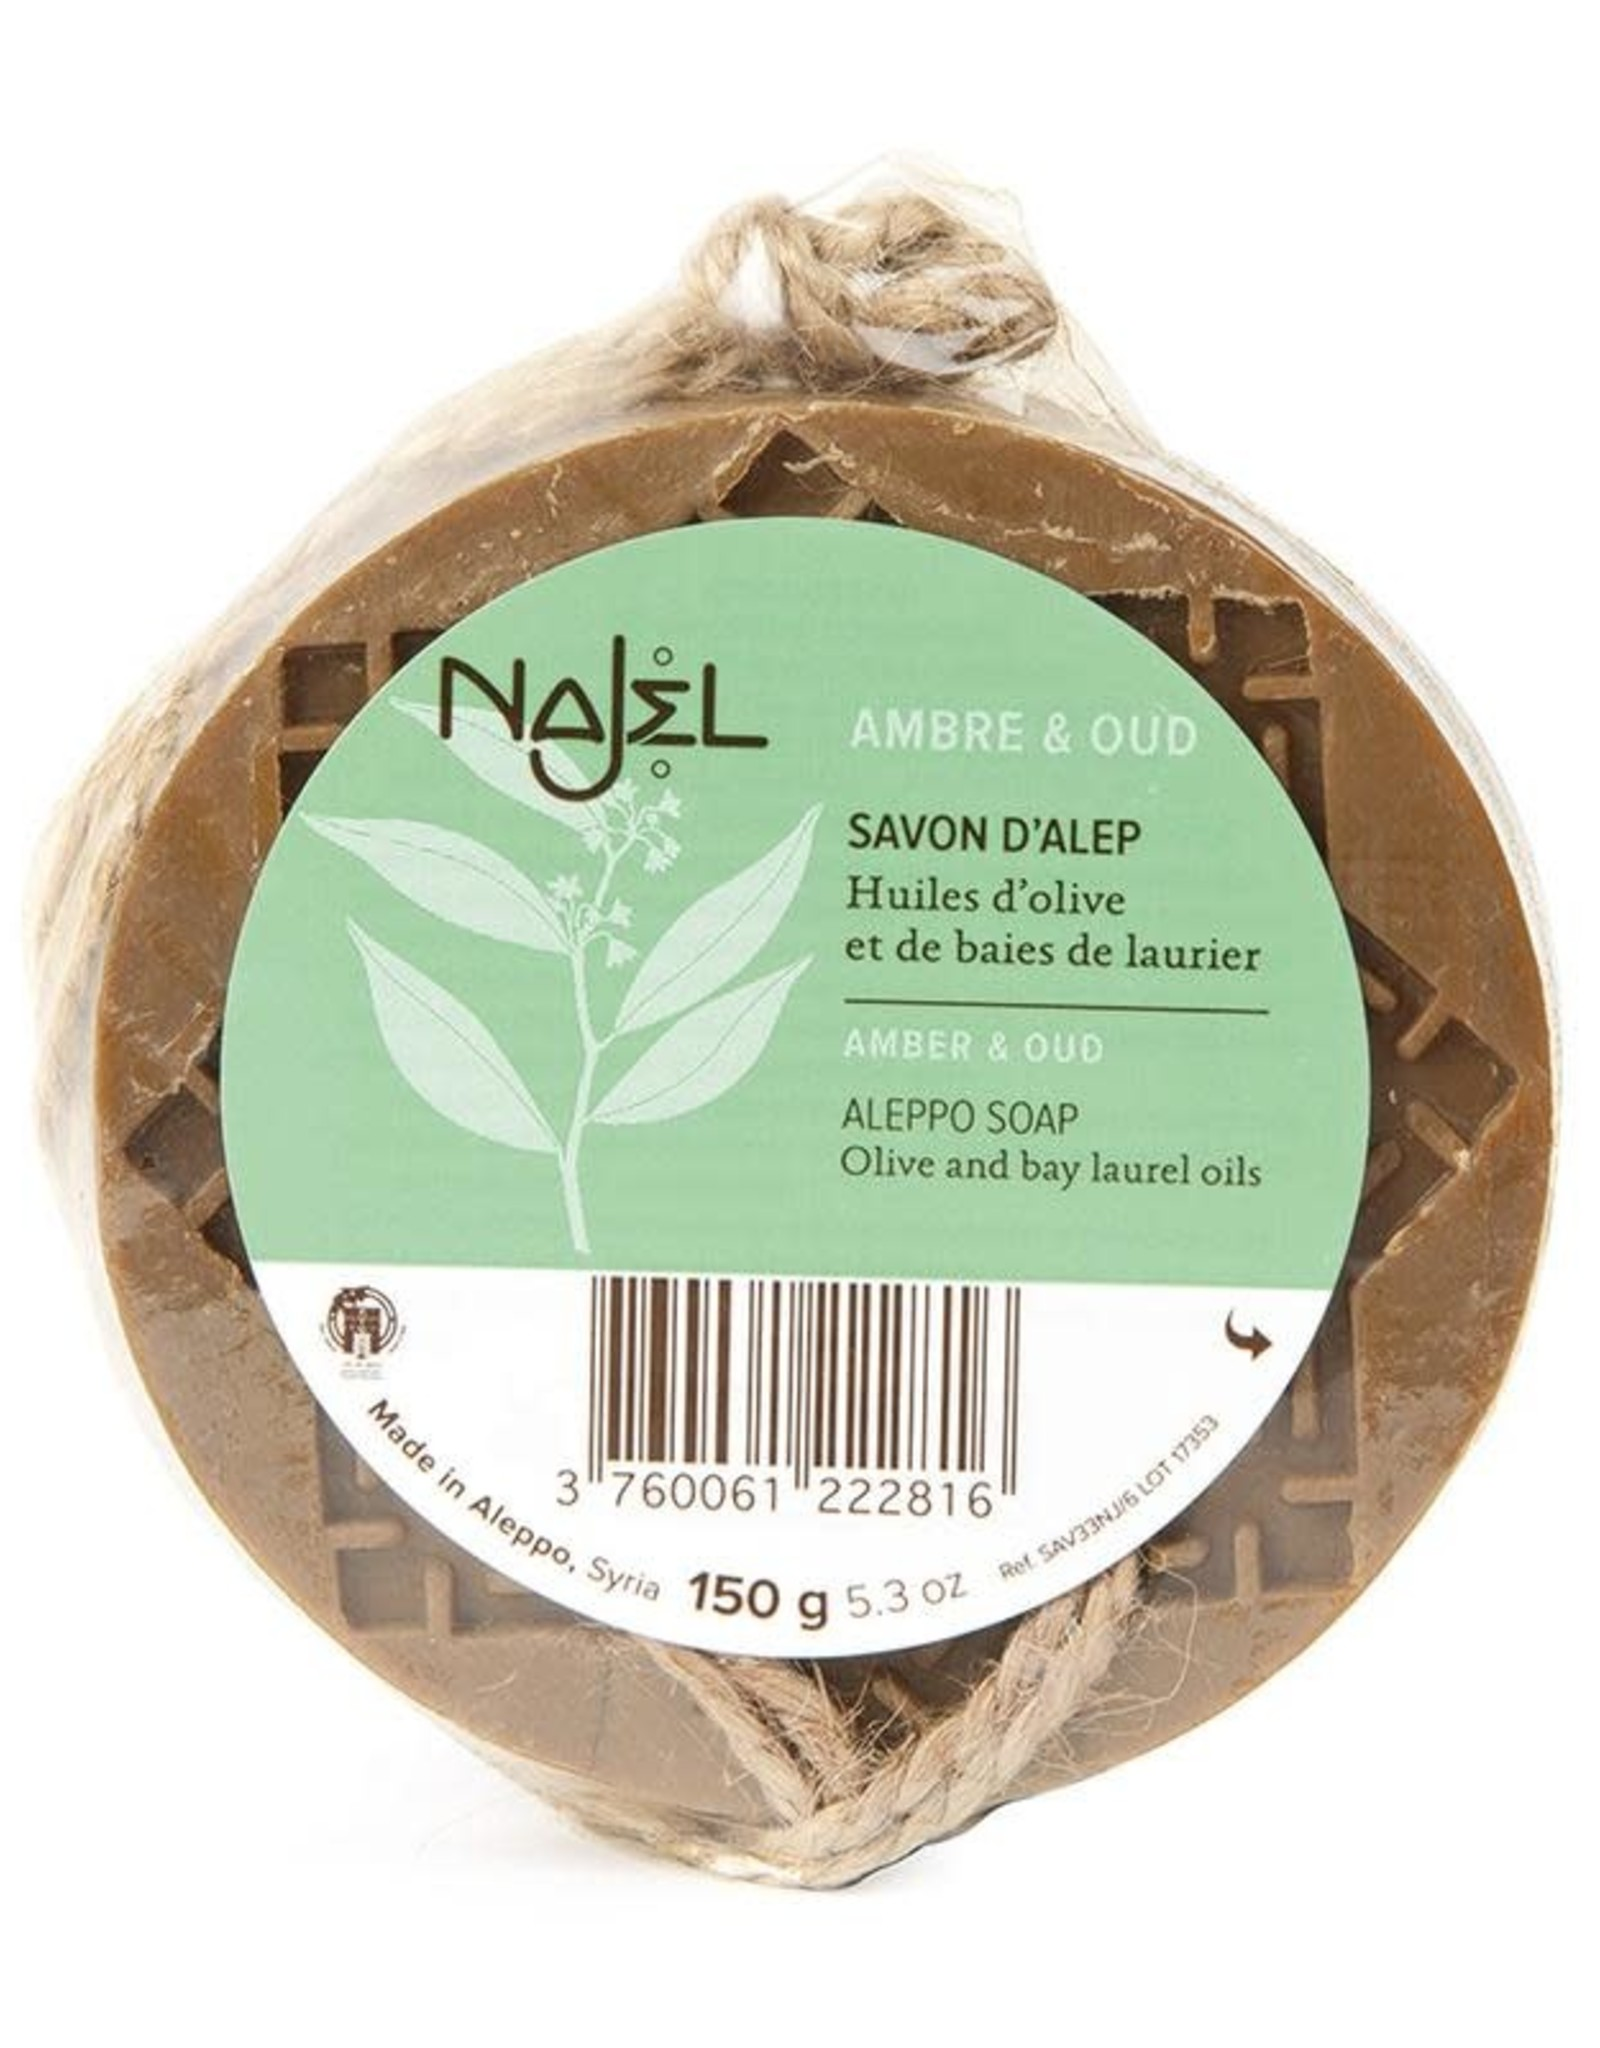 Najel Aleppo zeep amber oud aroma aan koord 150 g